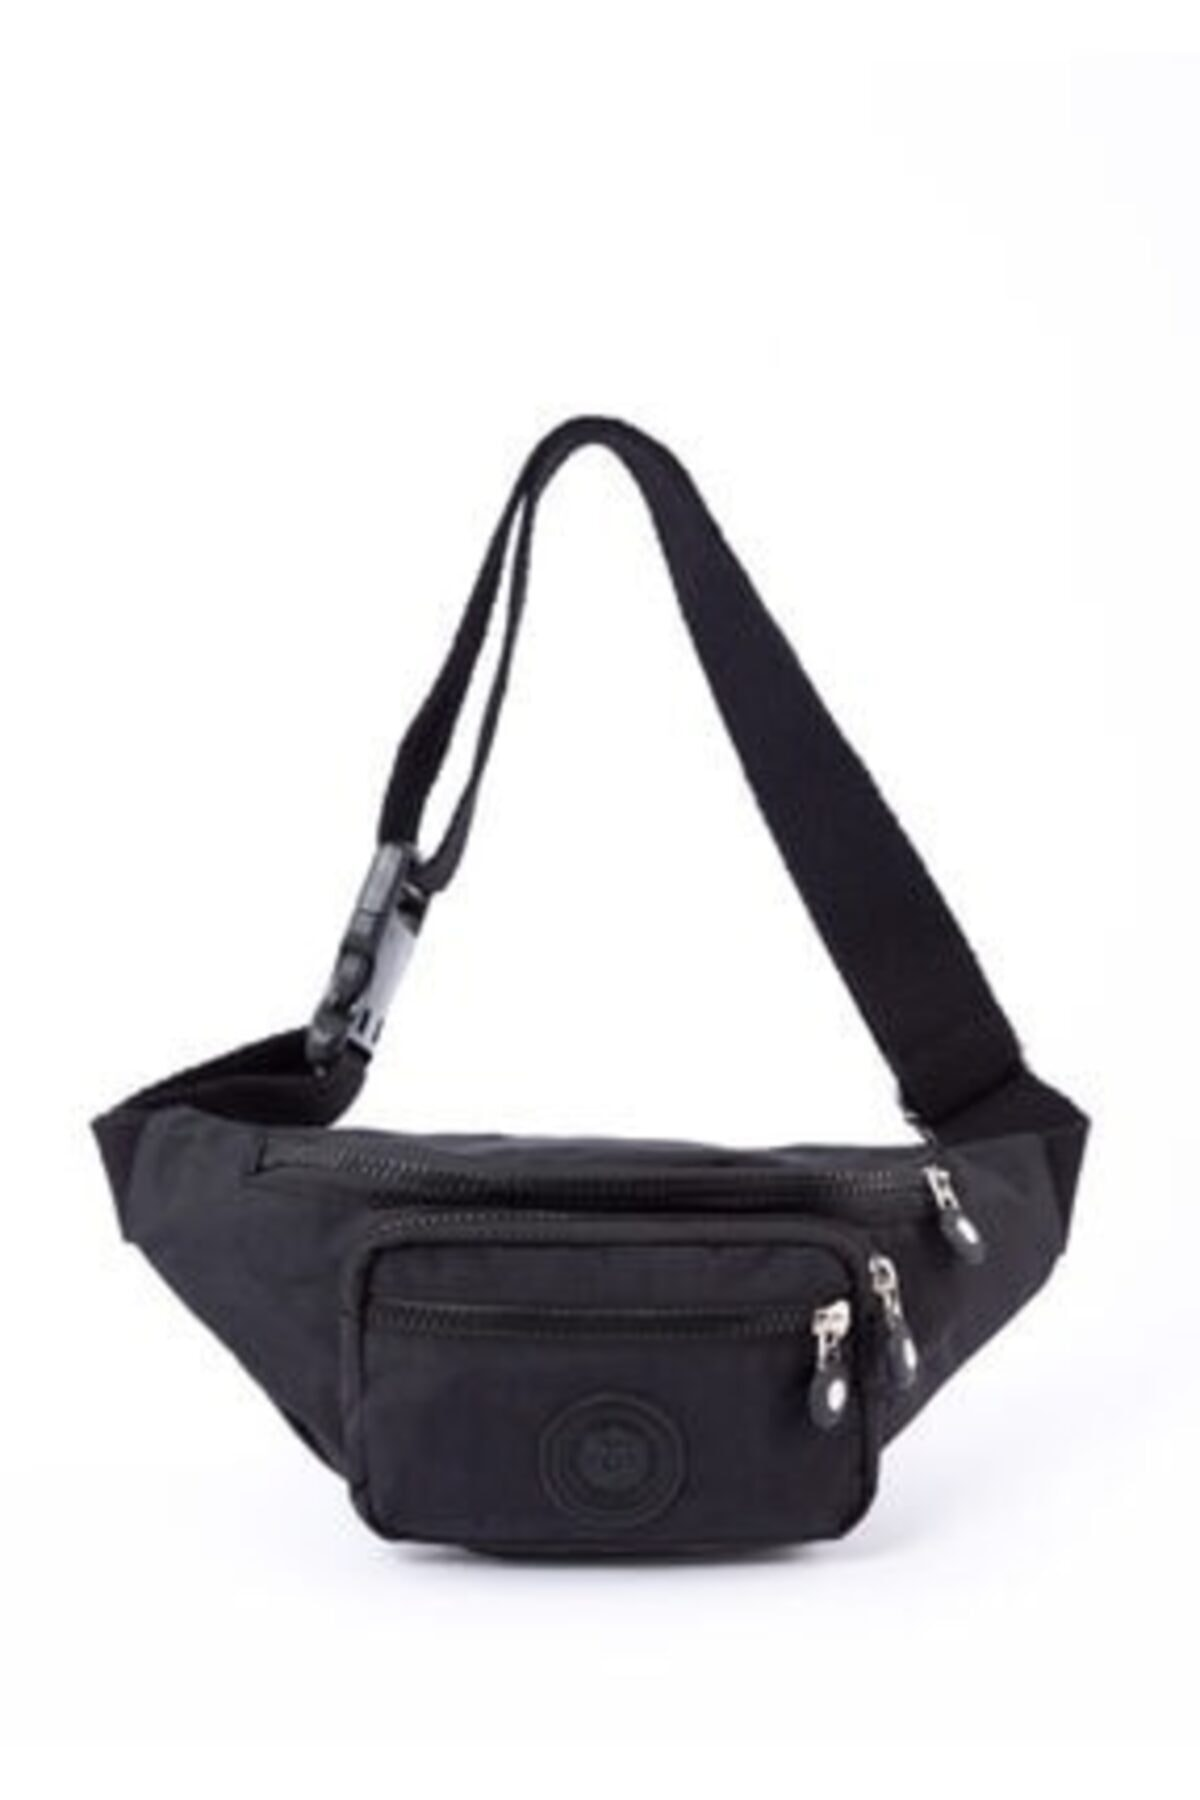 خرید پستی کیف کمری اصل برند Newish Polo رنگ مشکی کد ty117141749